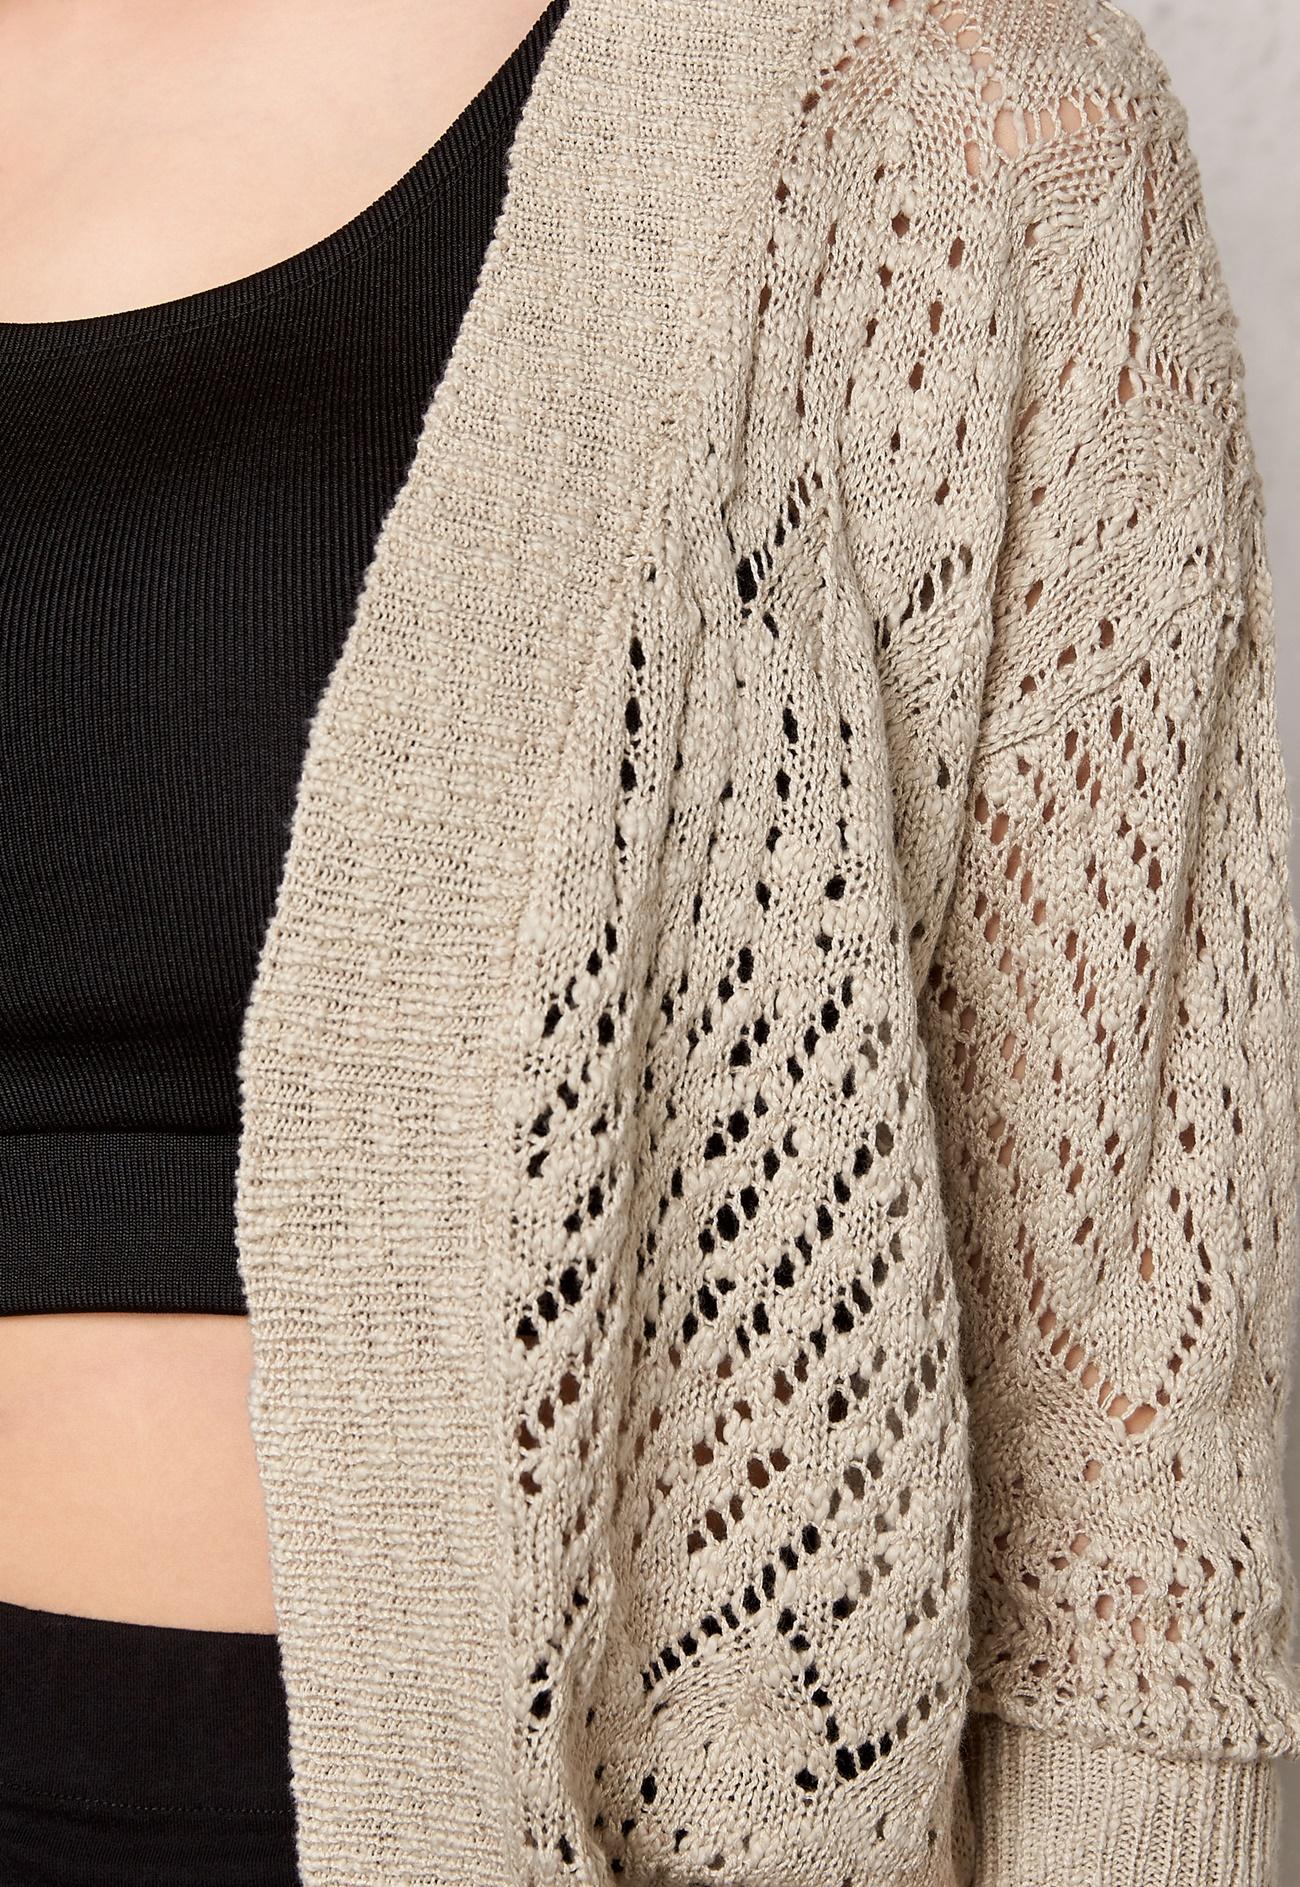 Vero Moda Knitting Yarns : Vero moda ally knit cardigan oatmeal bubbleroom